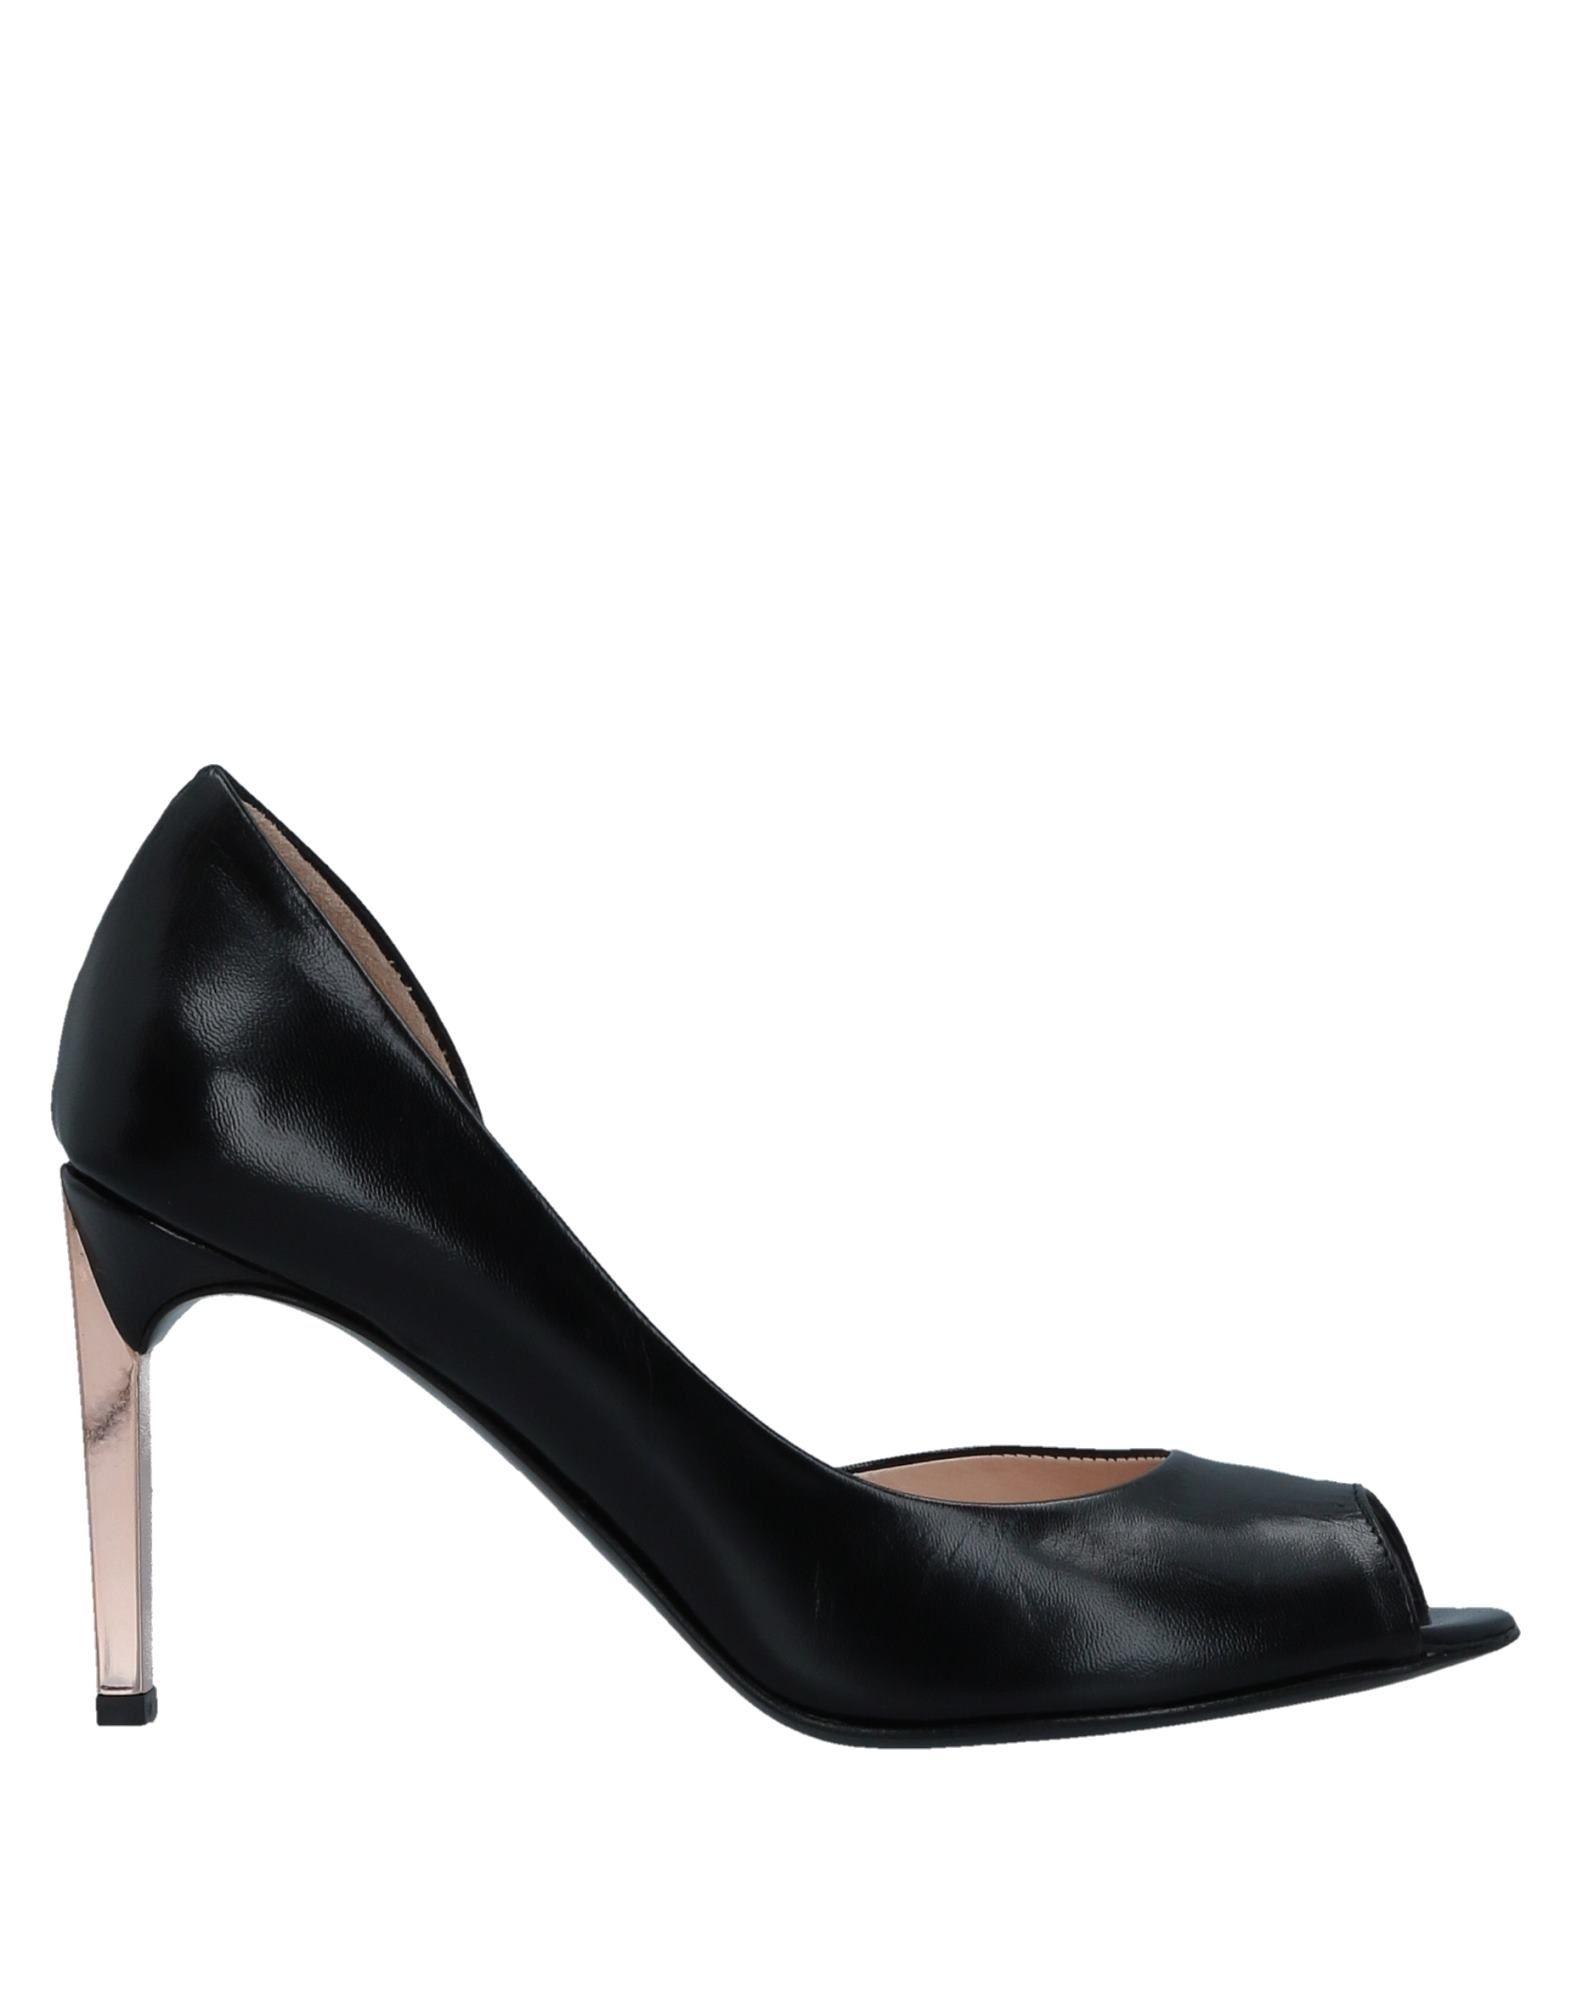 Sandali Werner offerte Donna - 11469844QW Nuove offerte Werner e scarpe comode f9c2ca